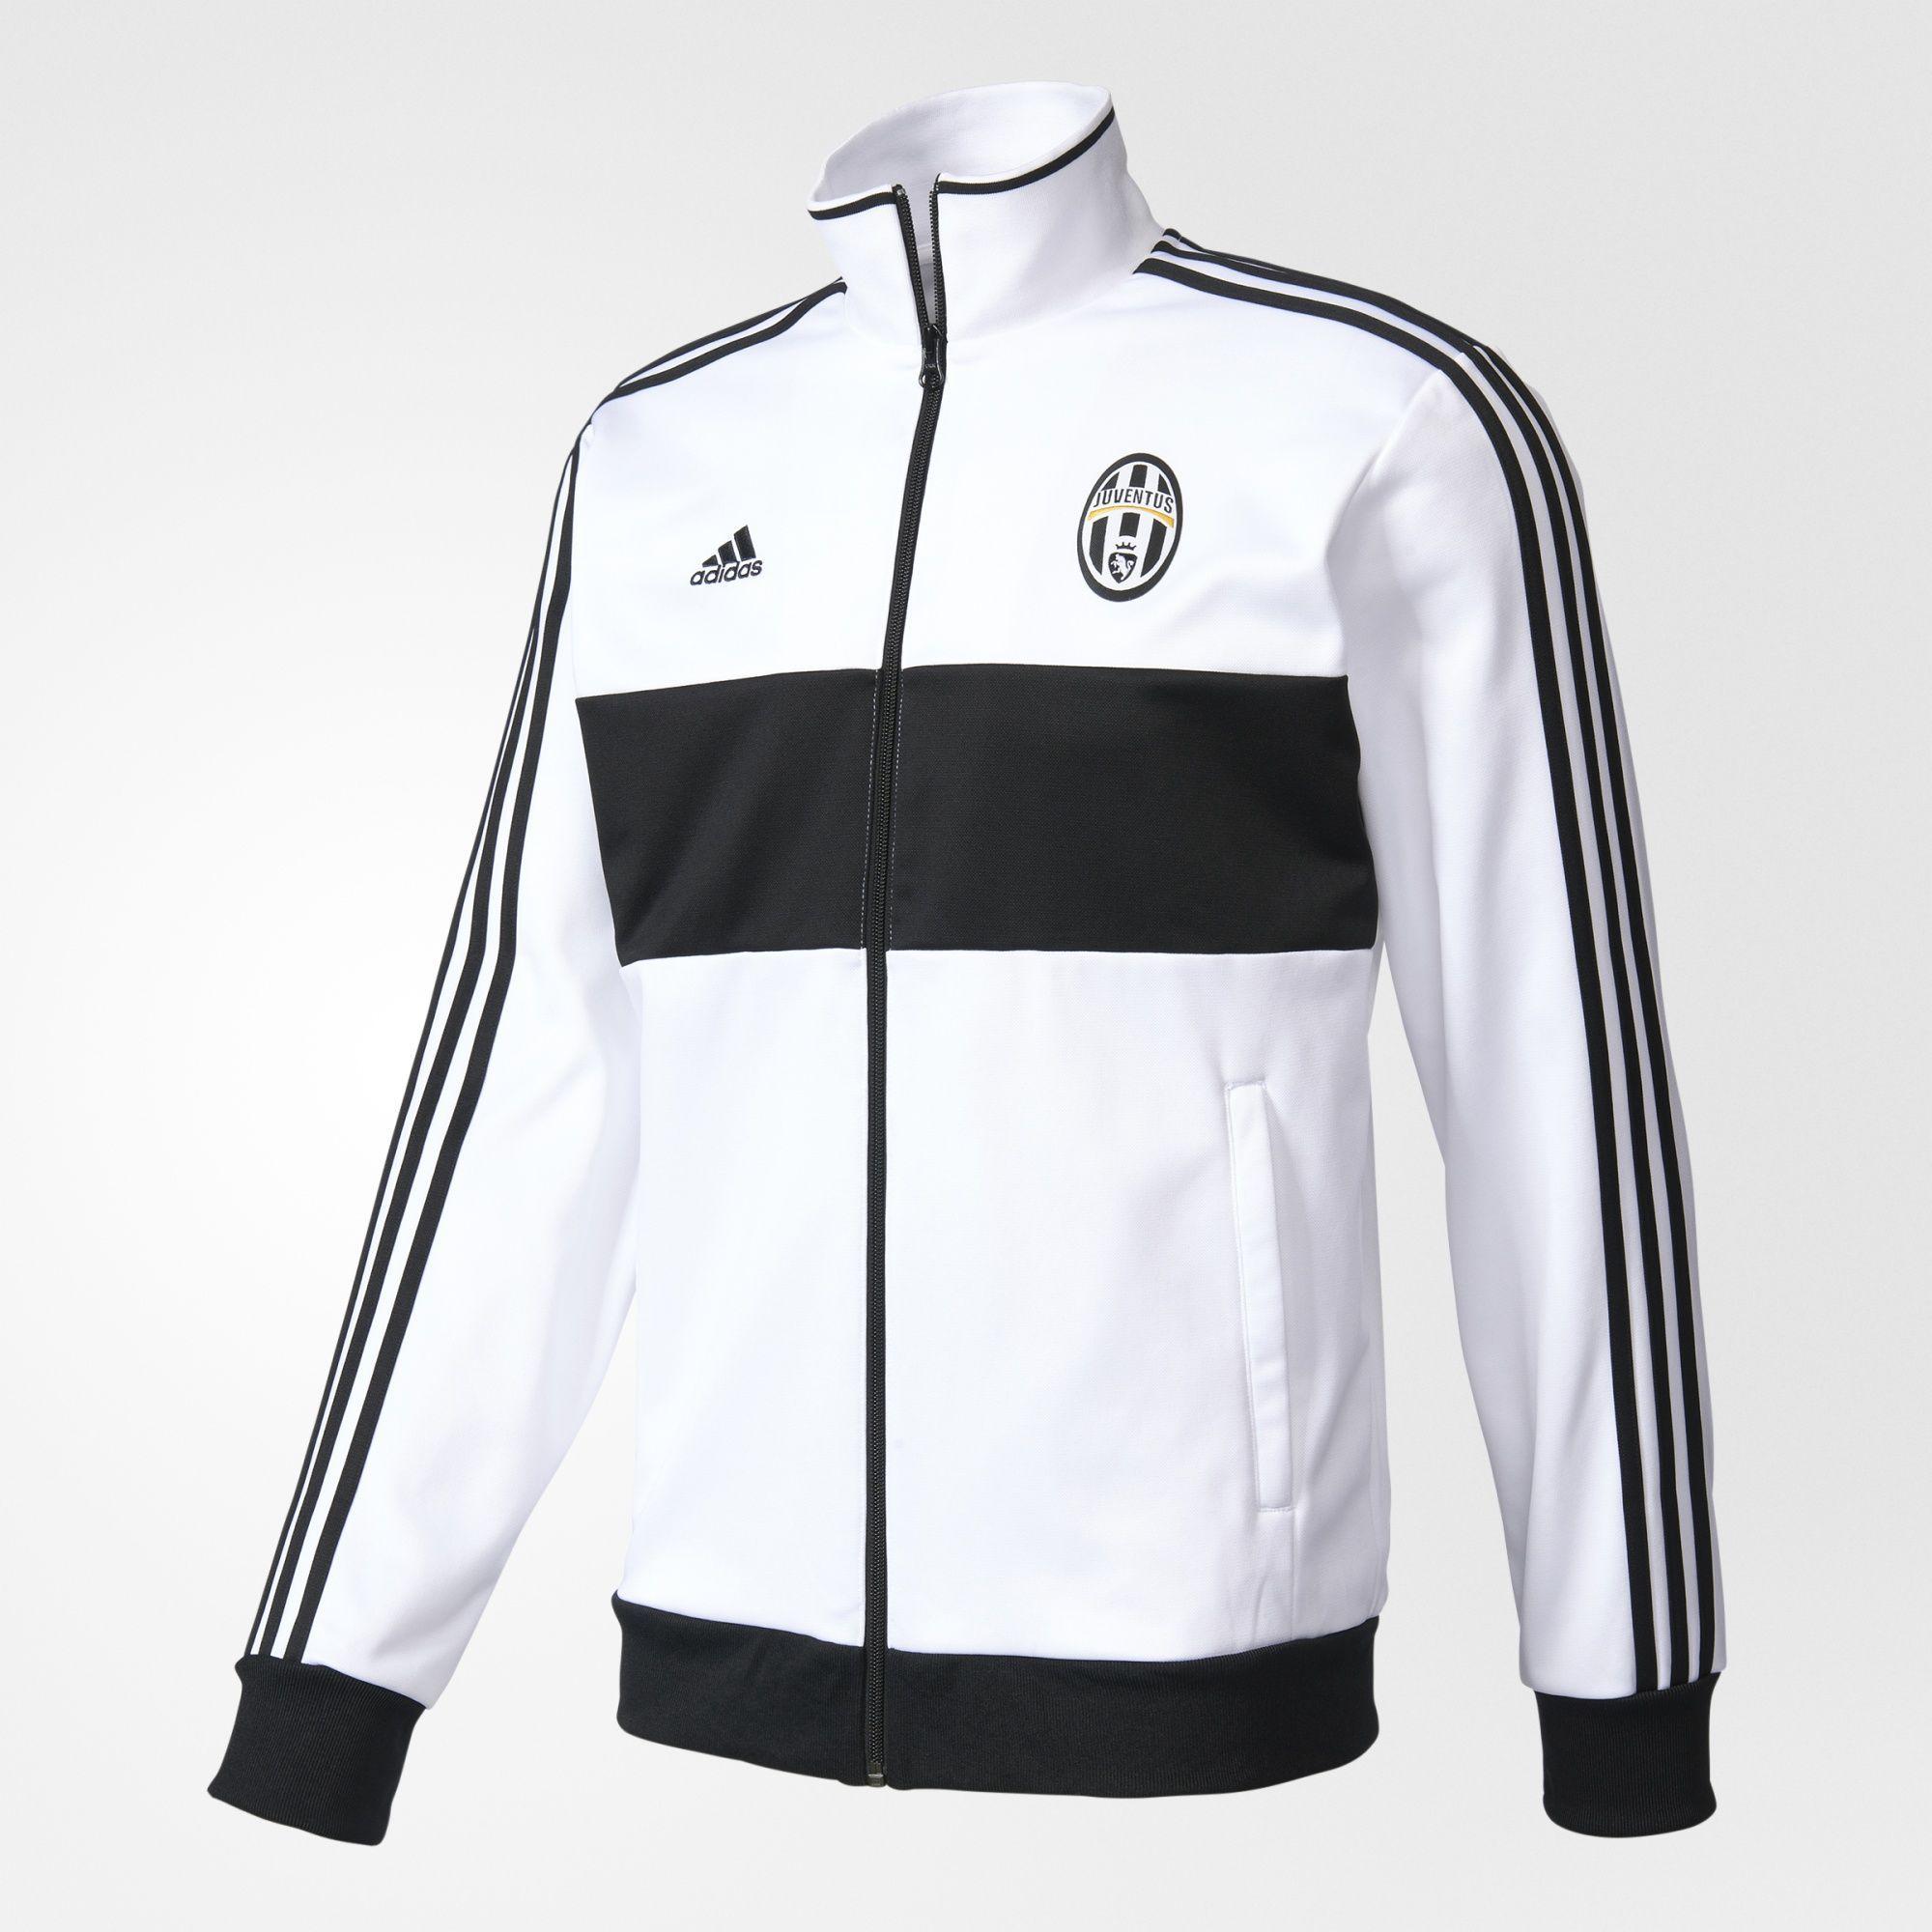 adidas - Juventus Chaqueta Deportiva 3 Rayas  8a6e52741409e